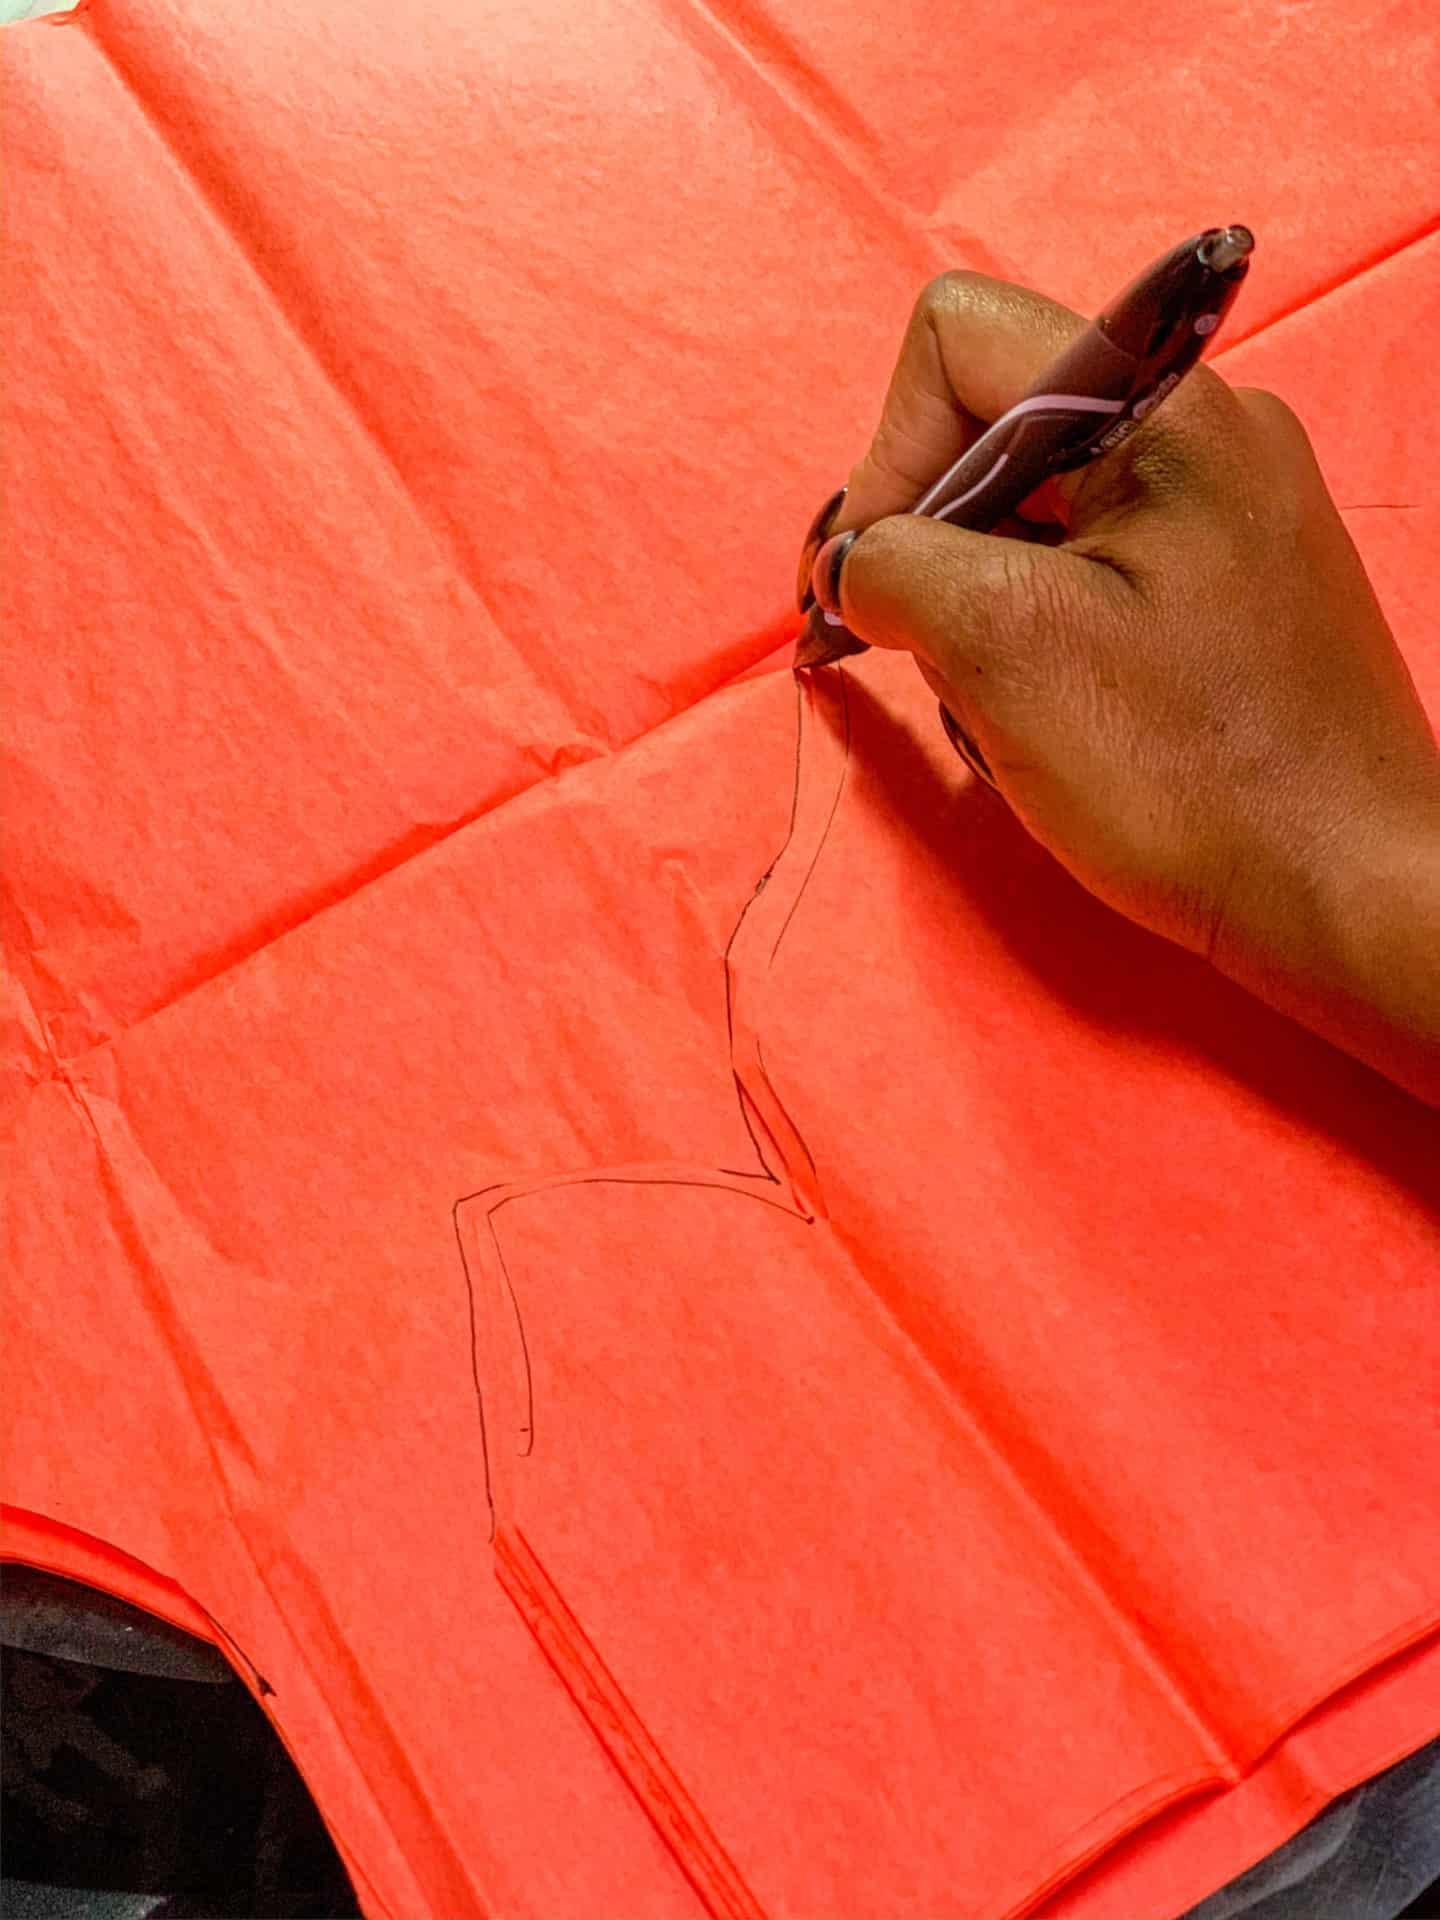 DIY Crafts - Tracing Paper Flames